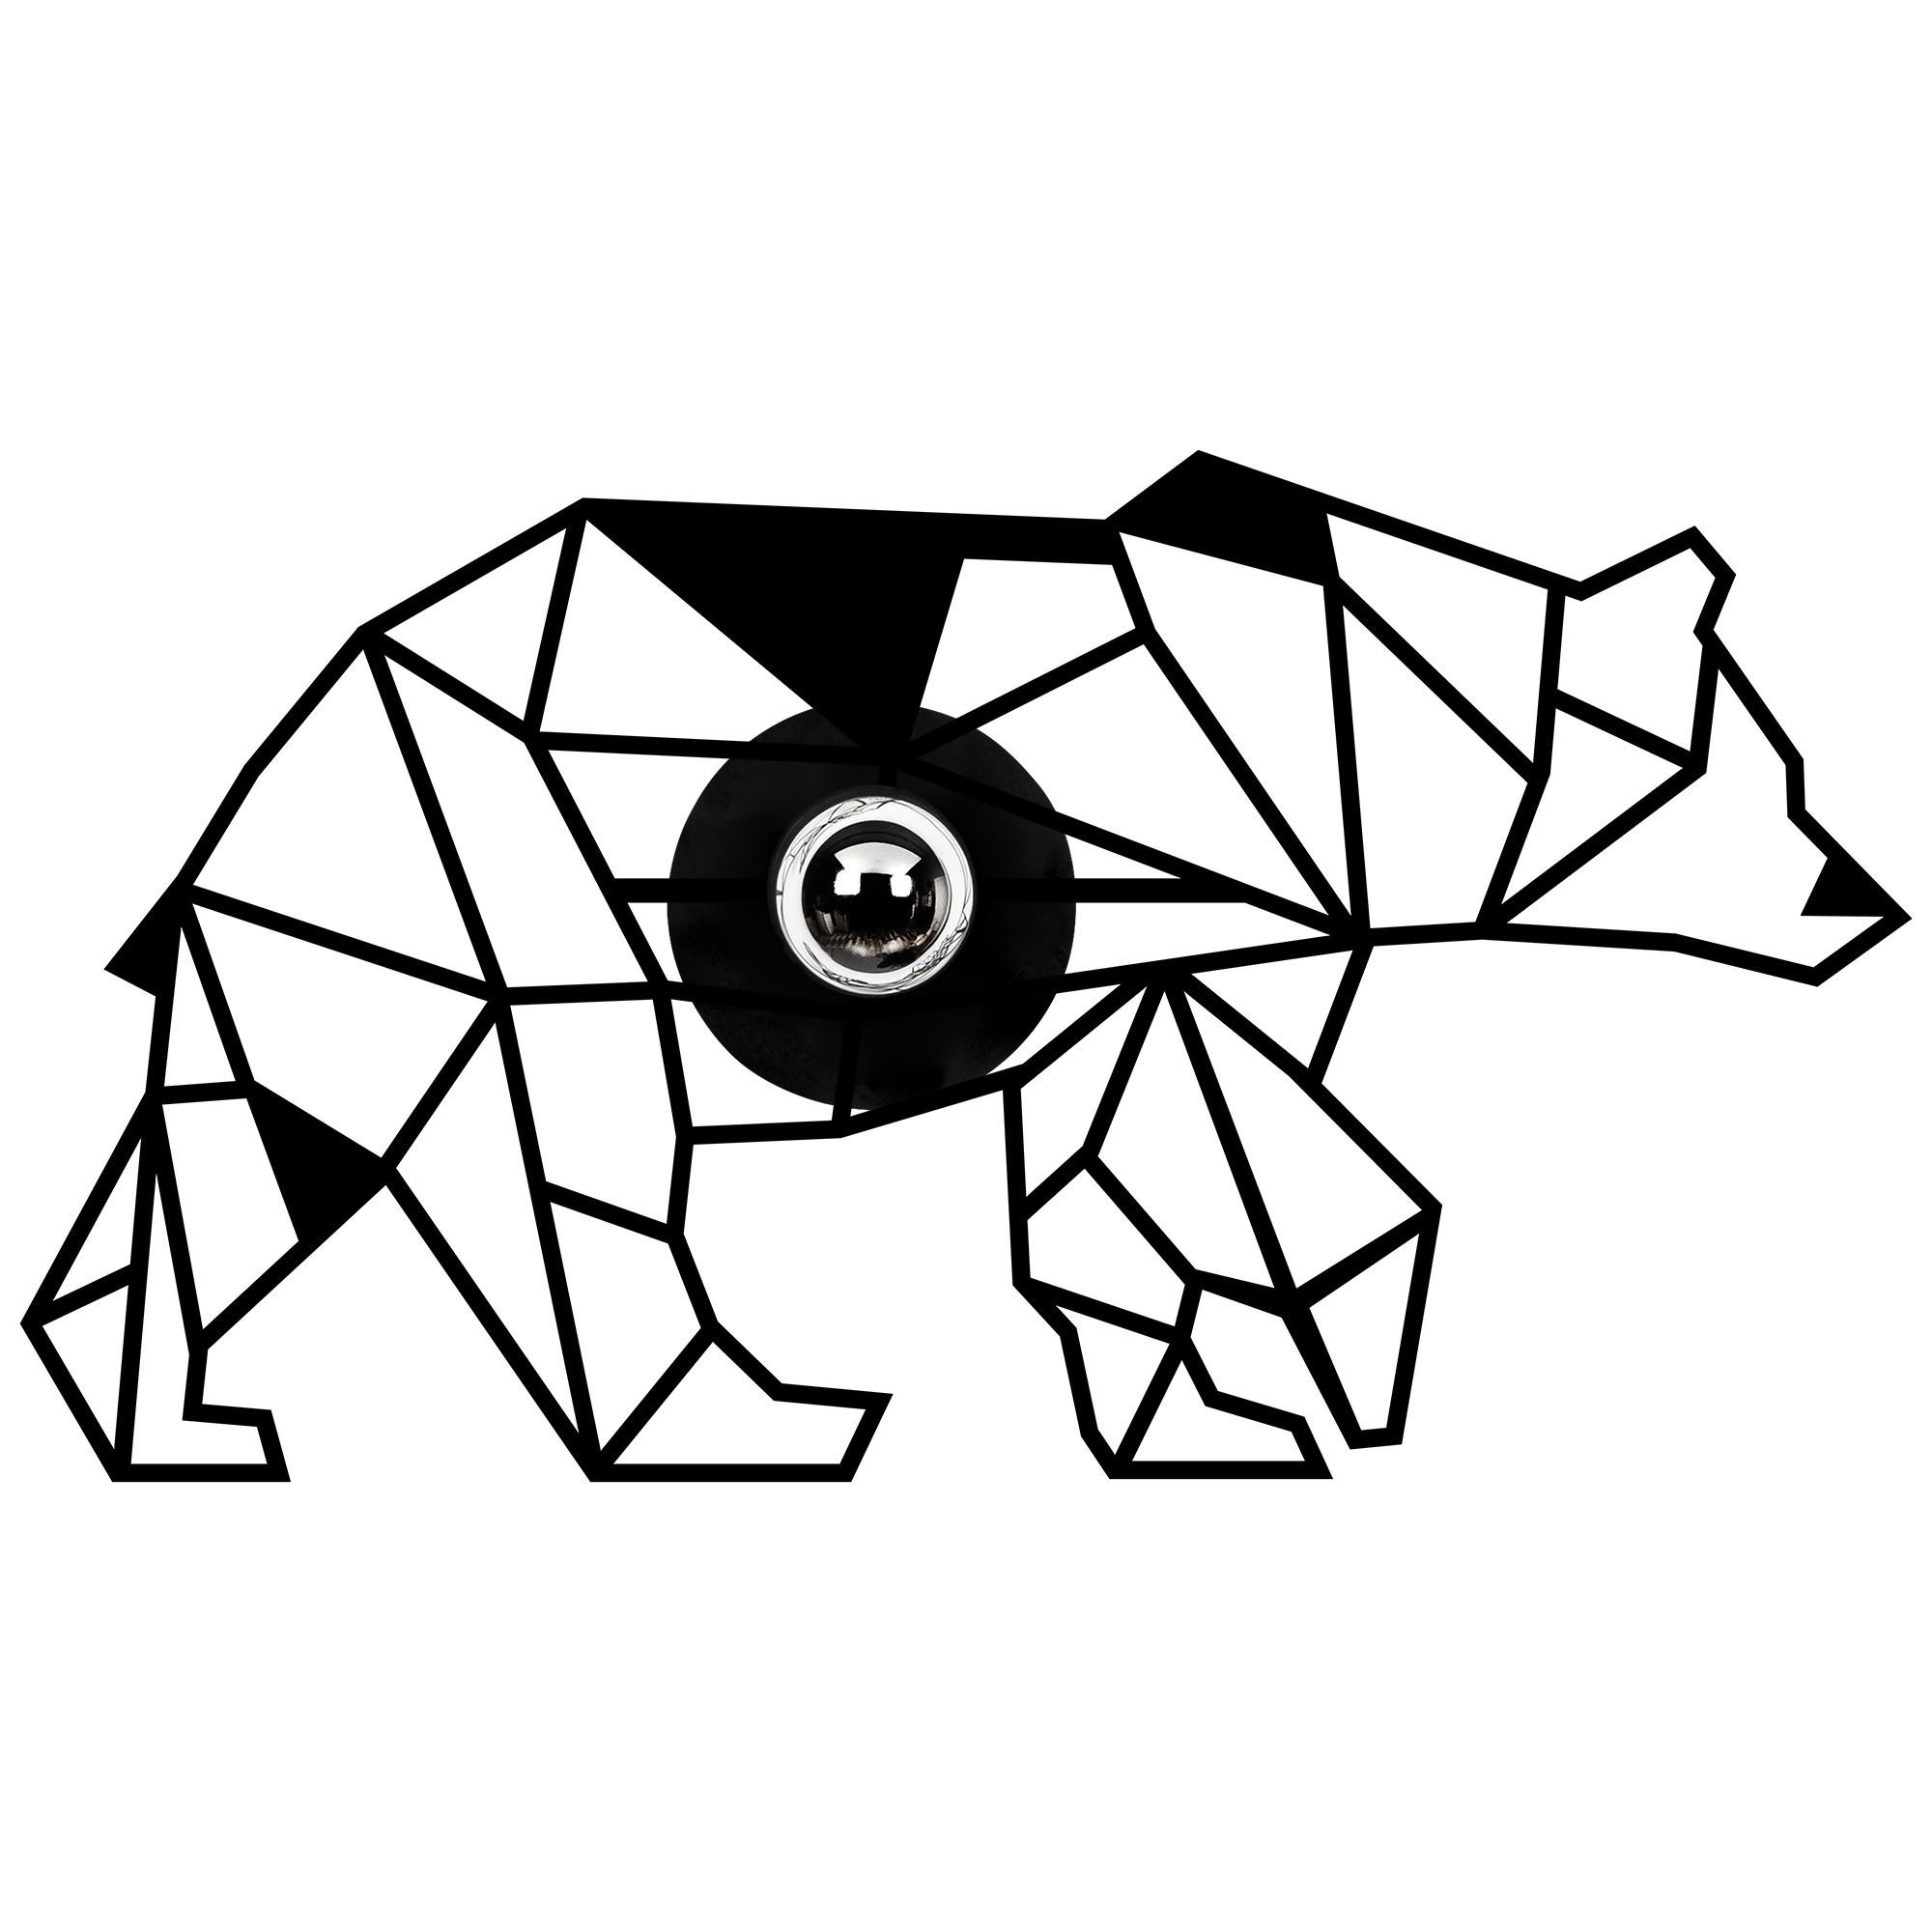 LED industriële wanddeco lamp dieren - bear - dimbaar - E27 fitting - vooraanzicht